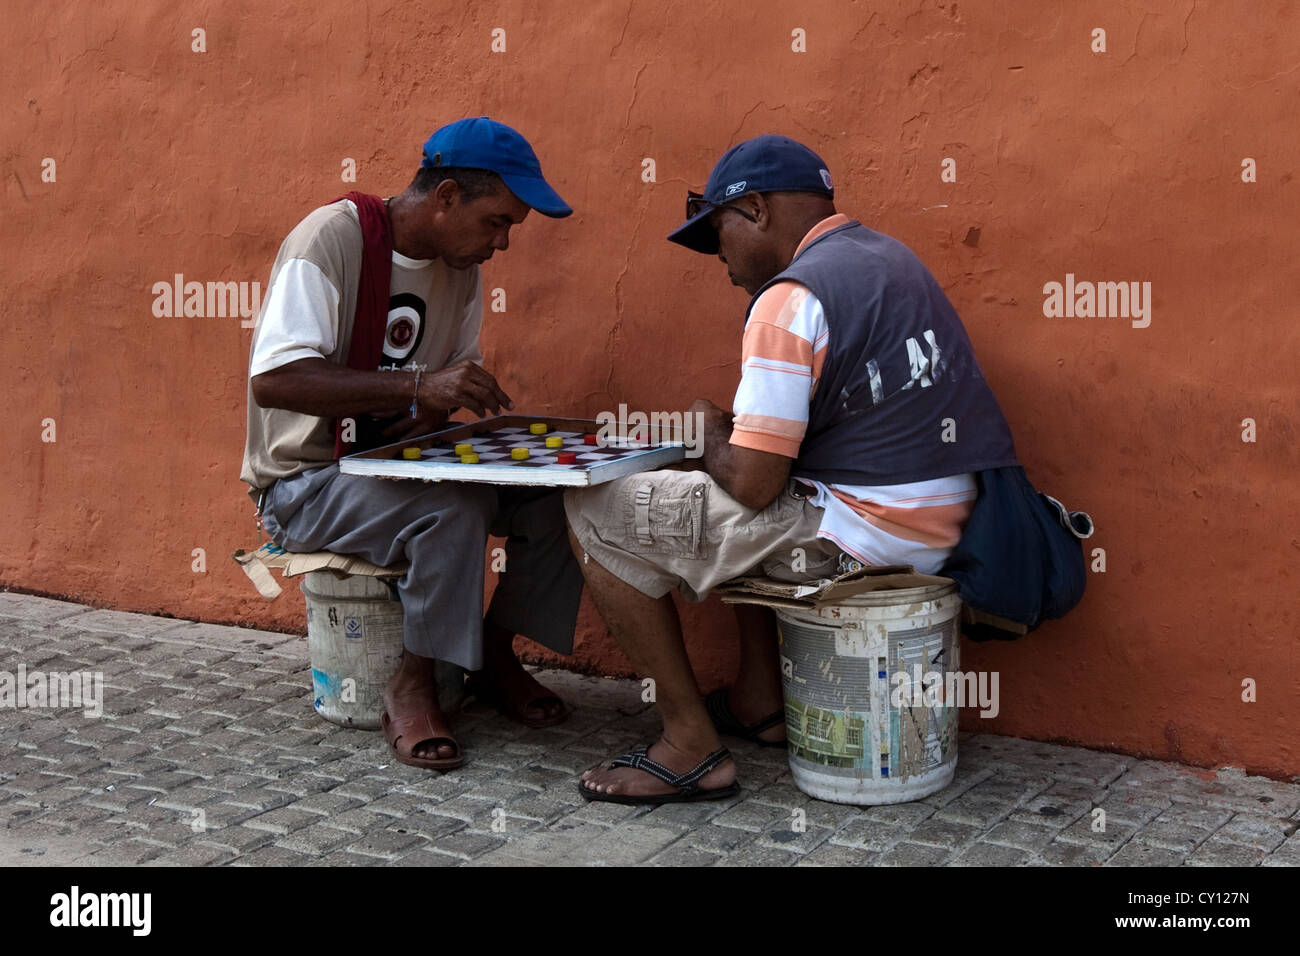 2 men playing draughts, Plaza San Diego Barrio San Diego Cartagena de Indias Colombia - Stock Image